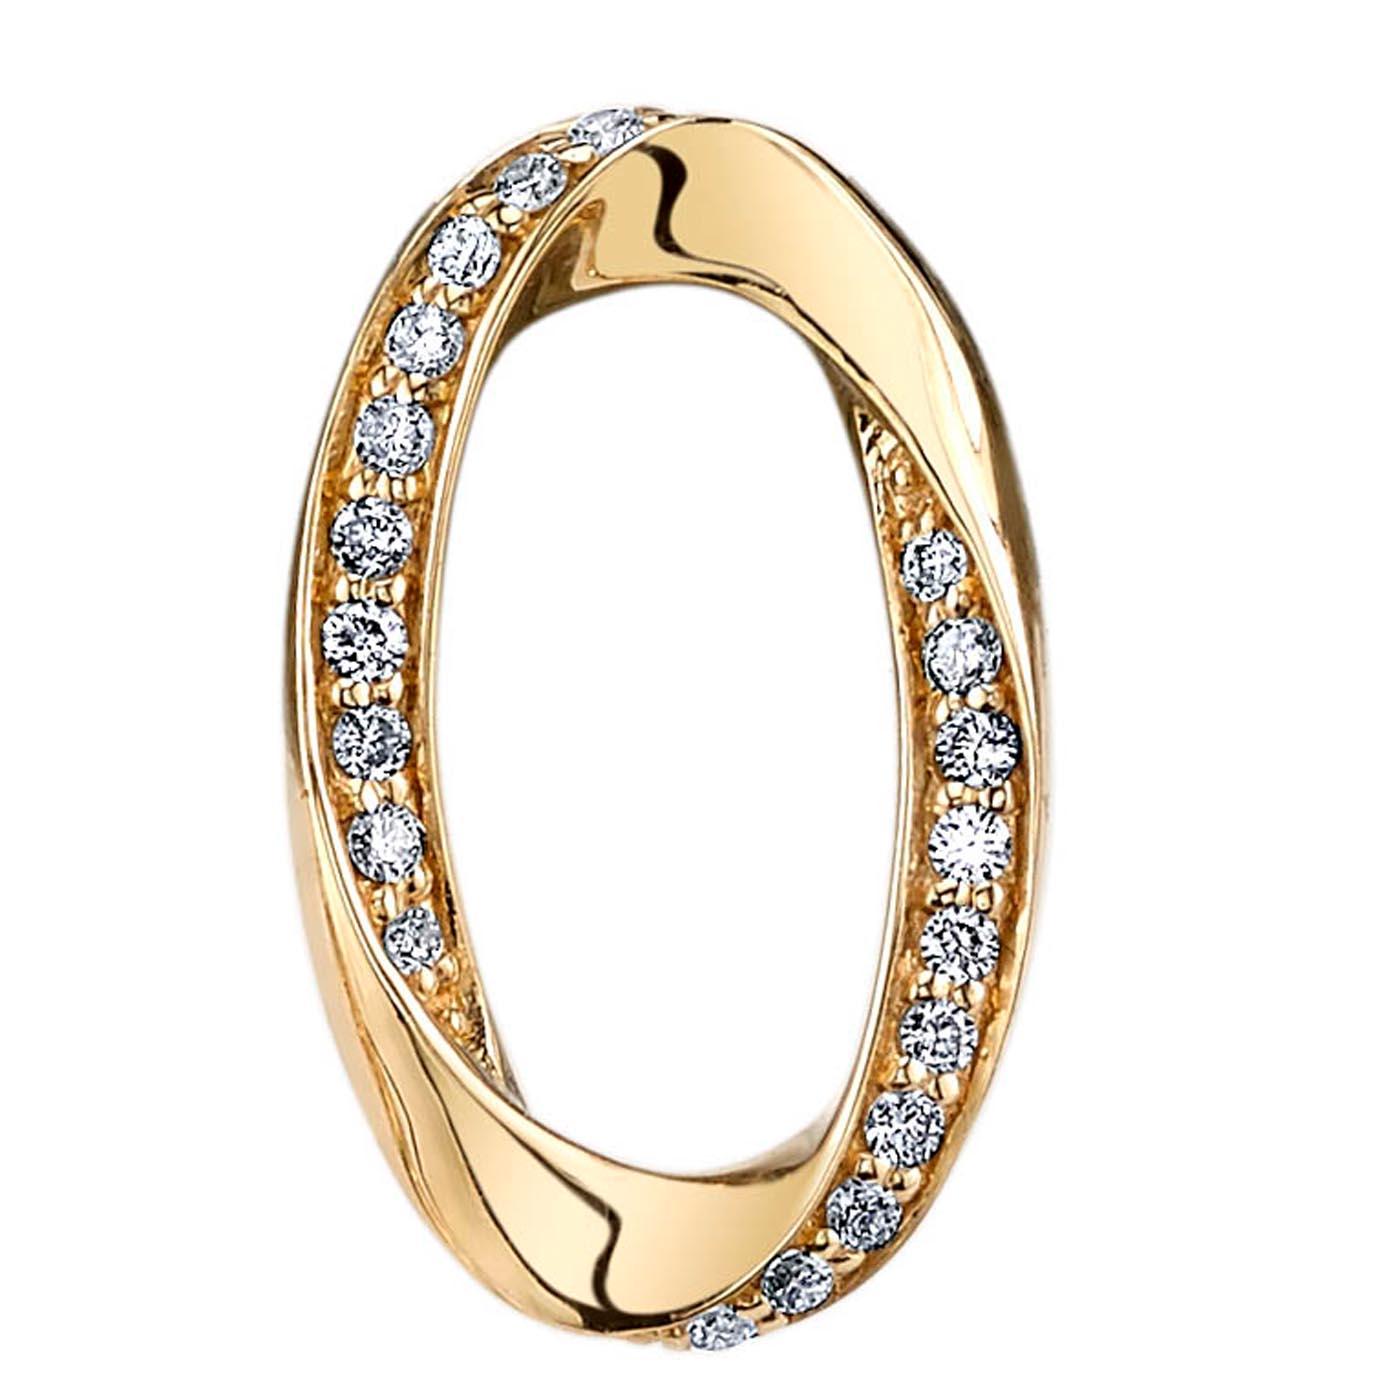 Diamond Earrings - Studs Style #: MARS-26577